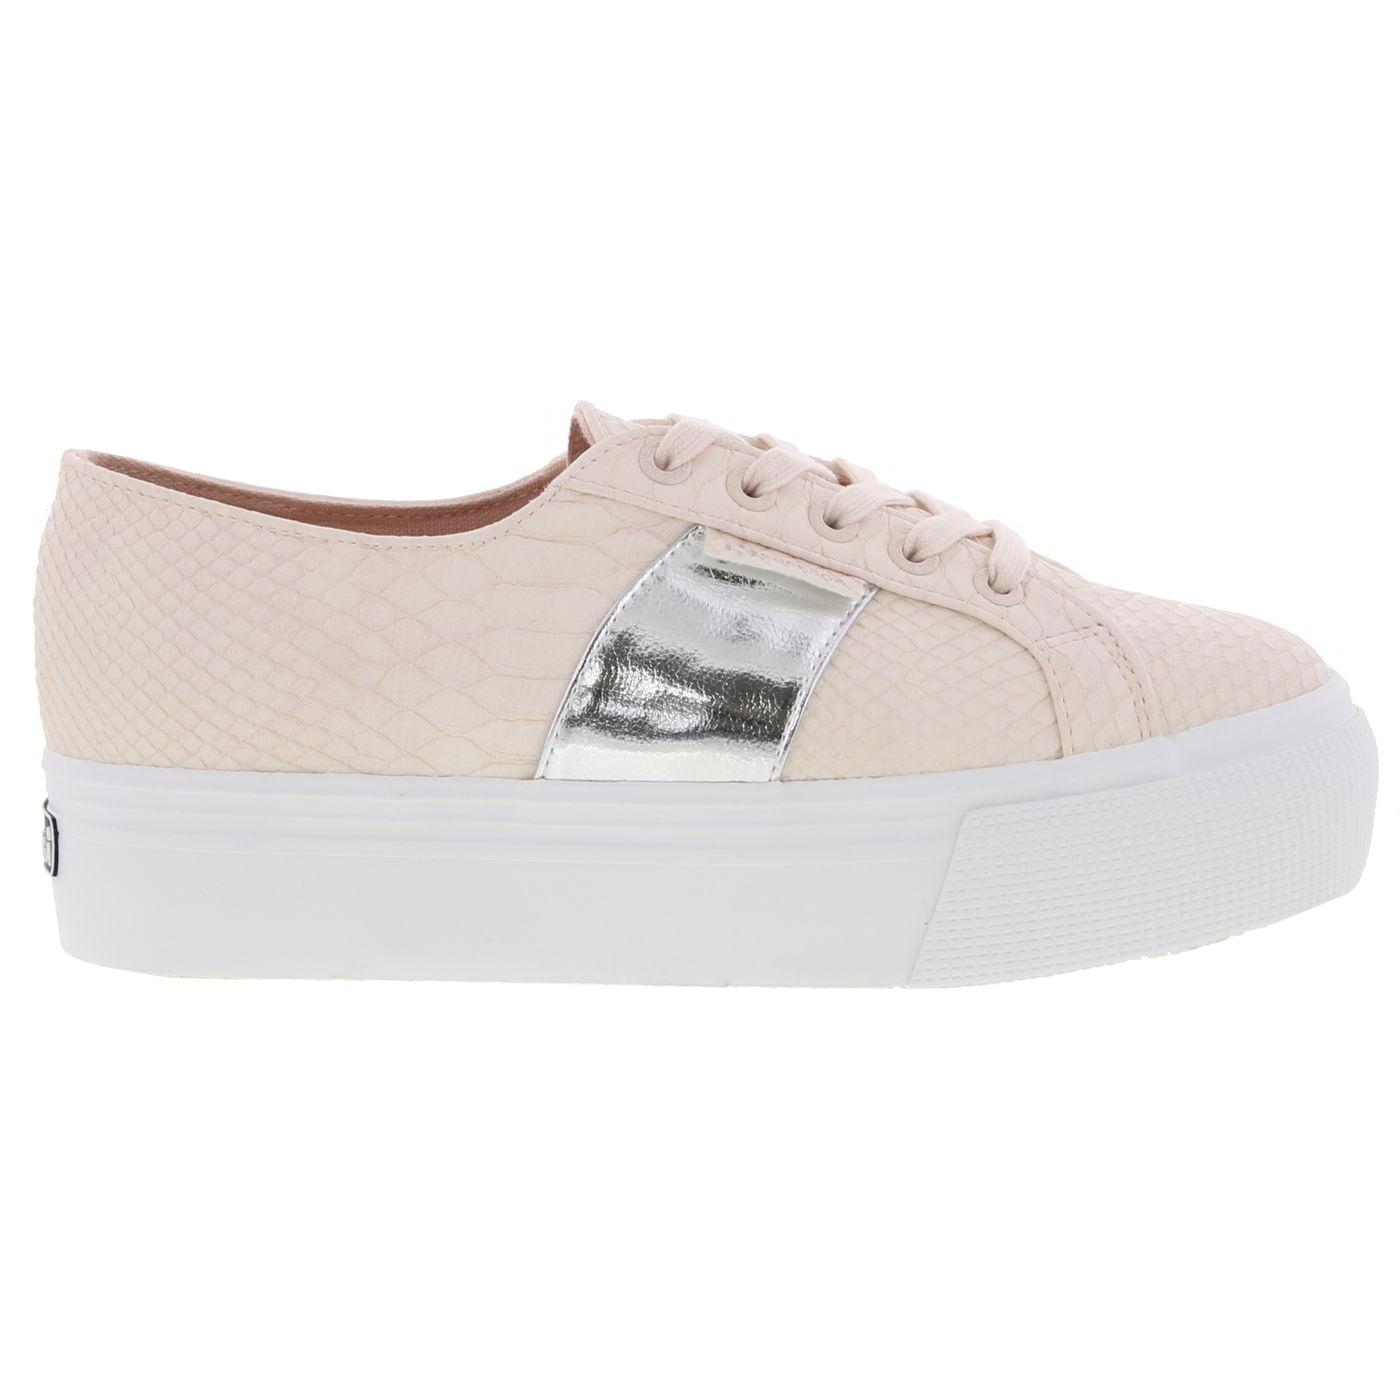 Superga Womens 2790 Snake Chunky Platform Trainers Shoes - Light Pink